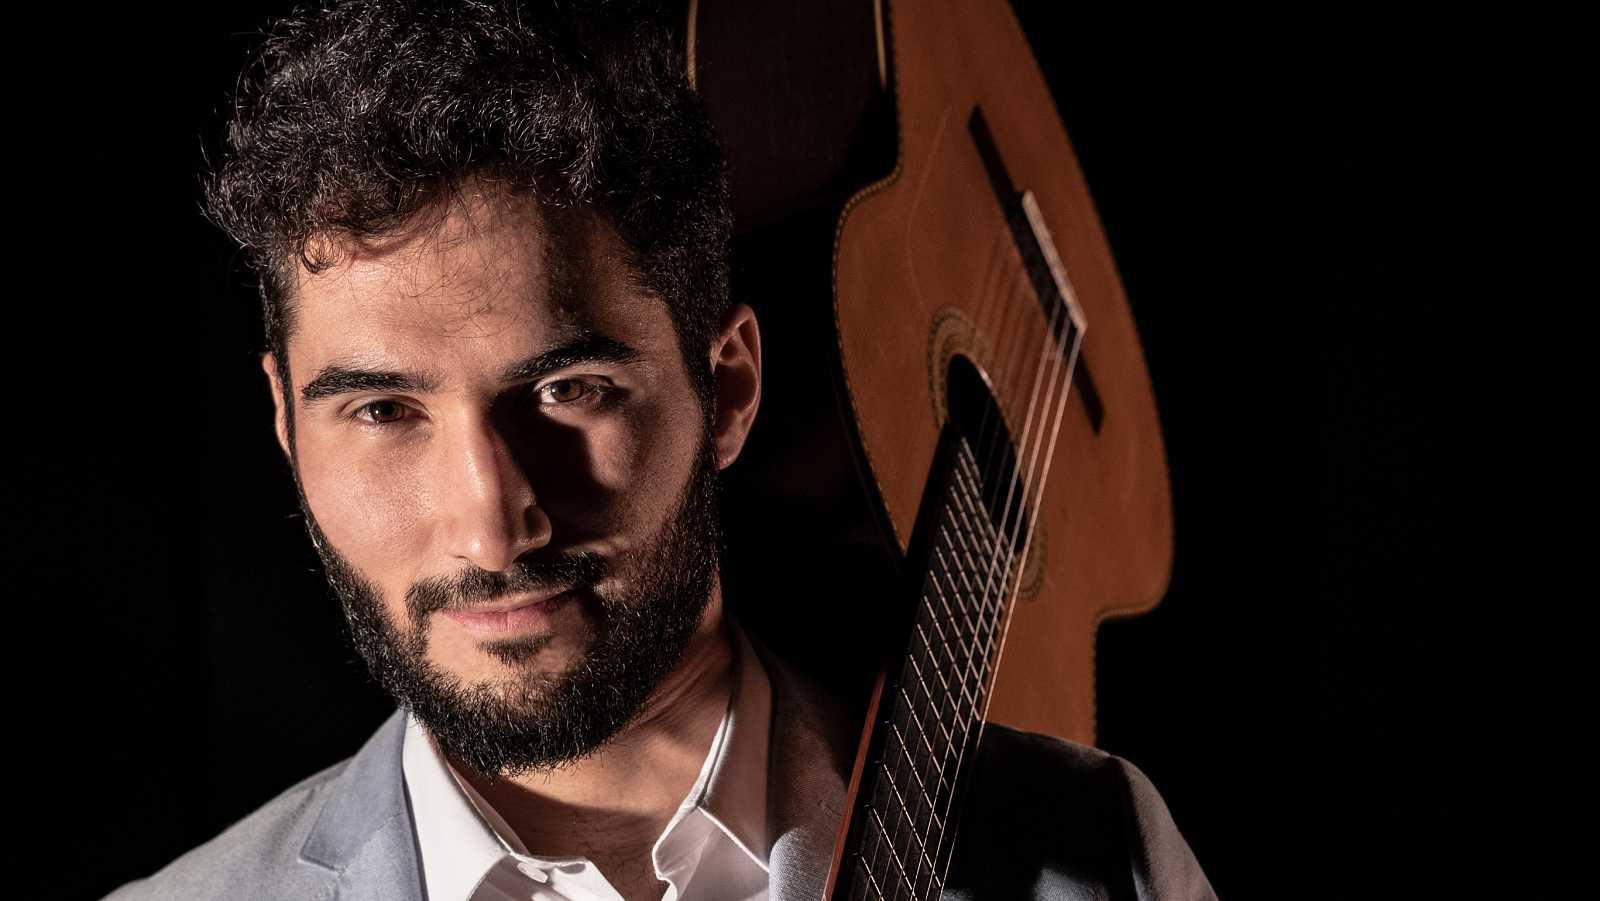 Javier García Verdugo o la guitarra transversal  - escuchar ahora